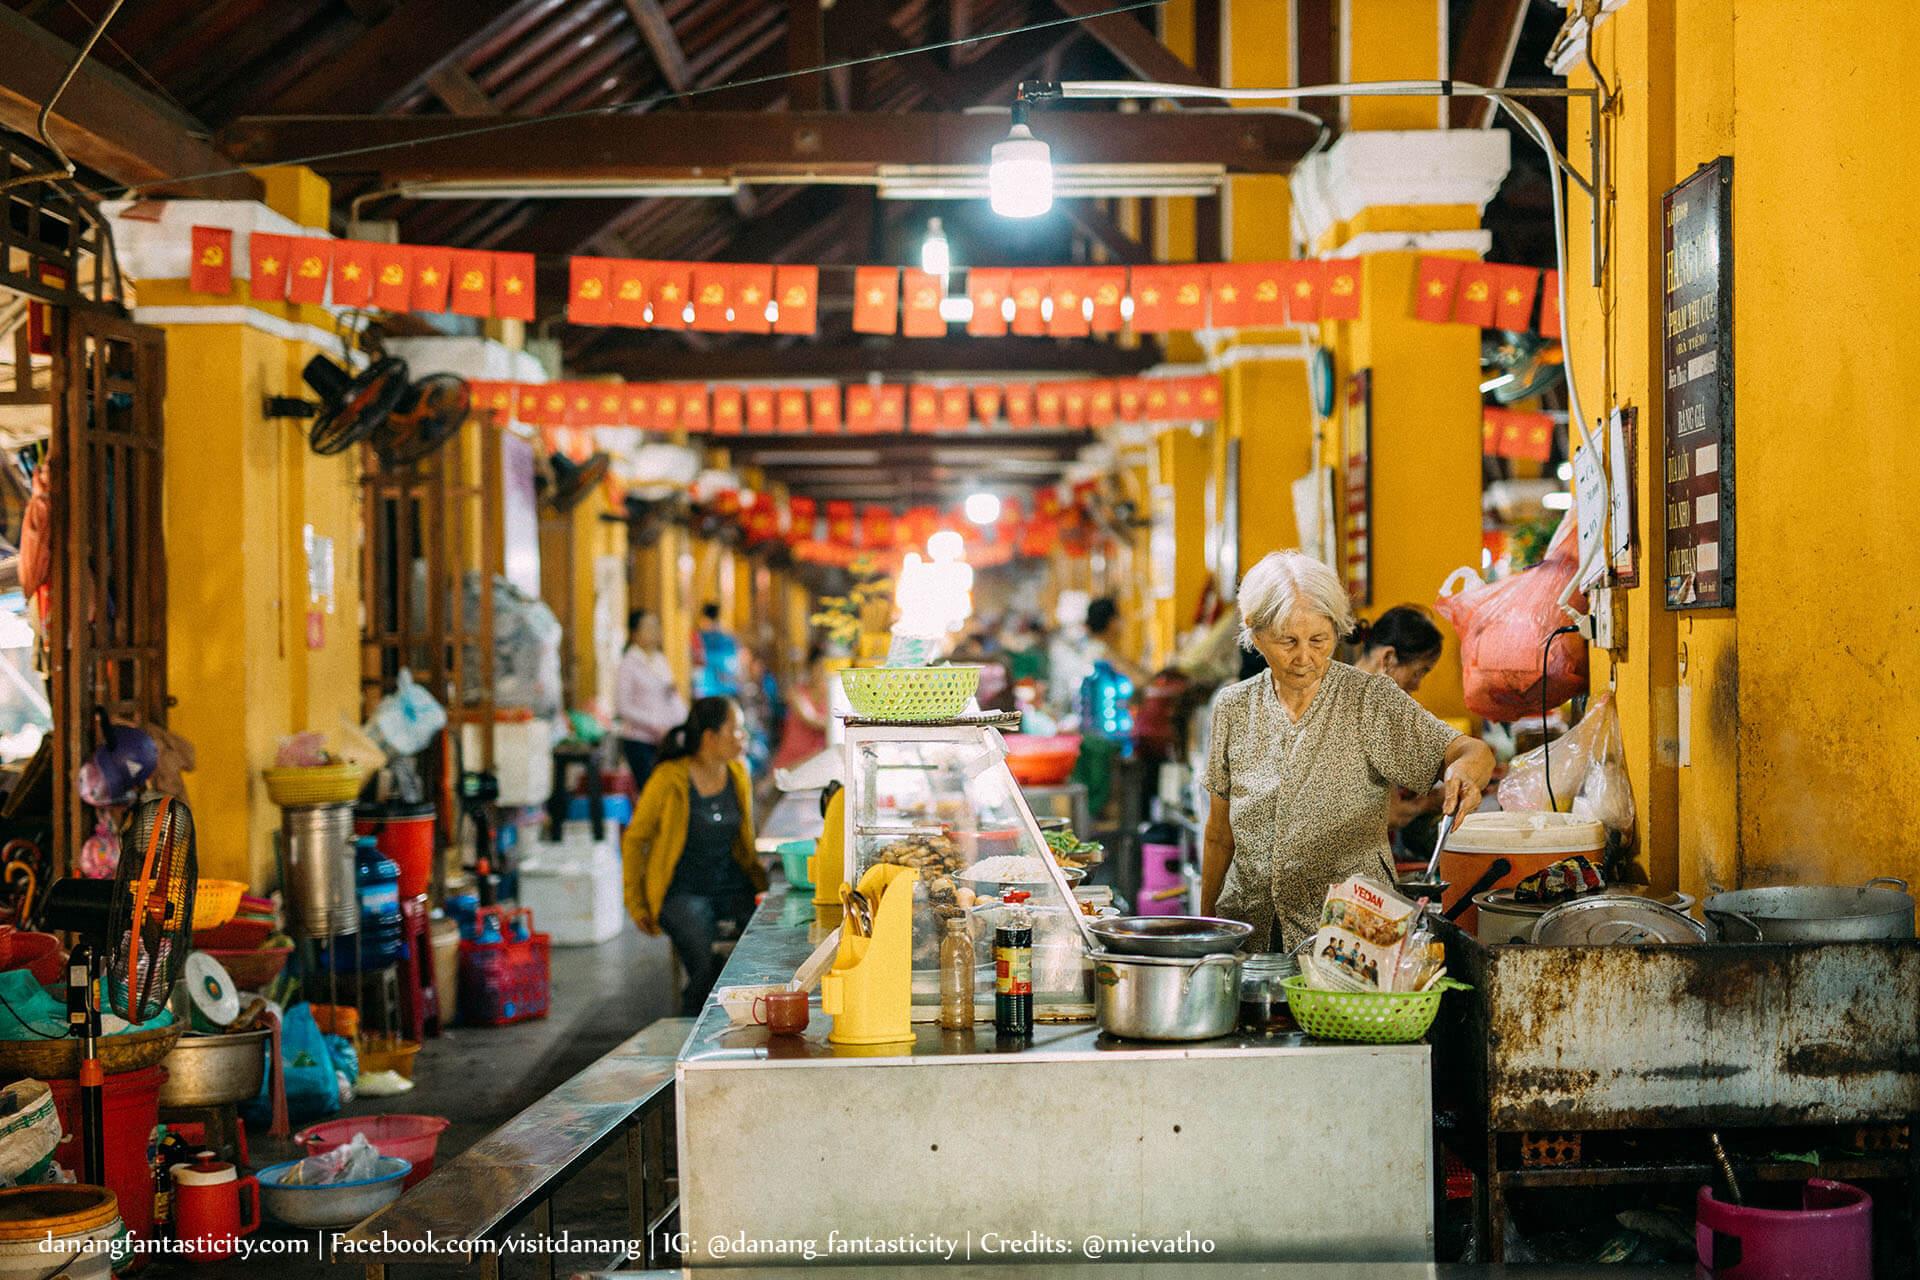 Da Nang Hoi An Anh Cho Minh Tren Chiec Xe Giac Mo Mievatho Danang Fantasticity Com An Gi 02